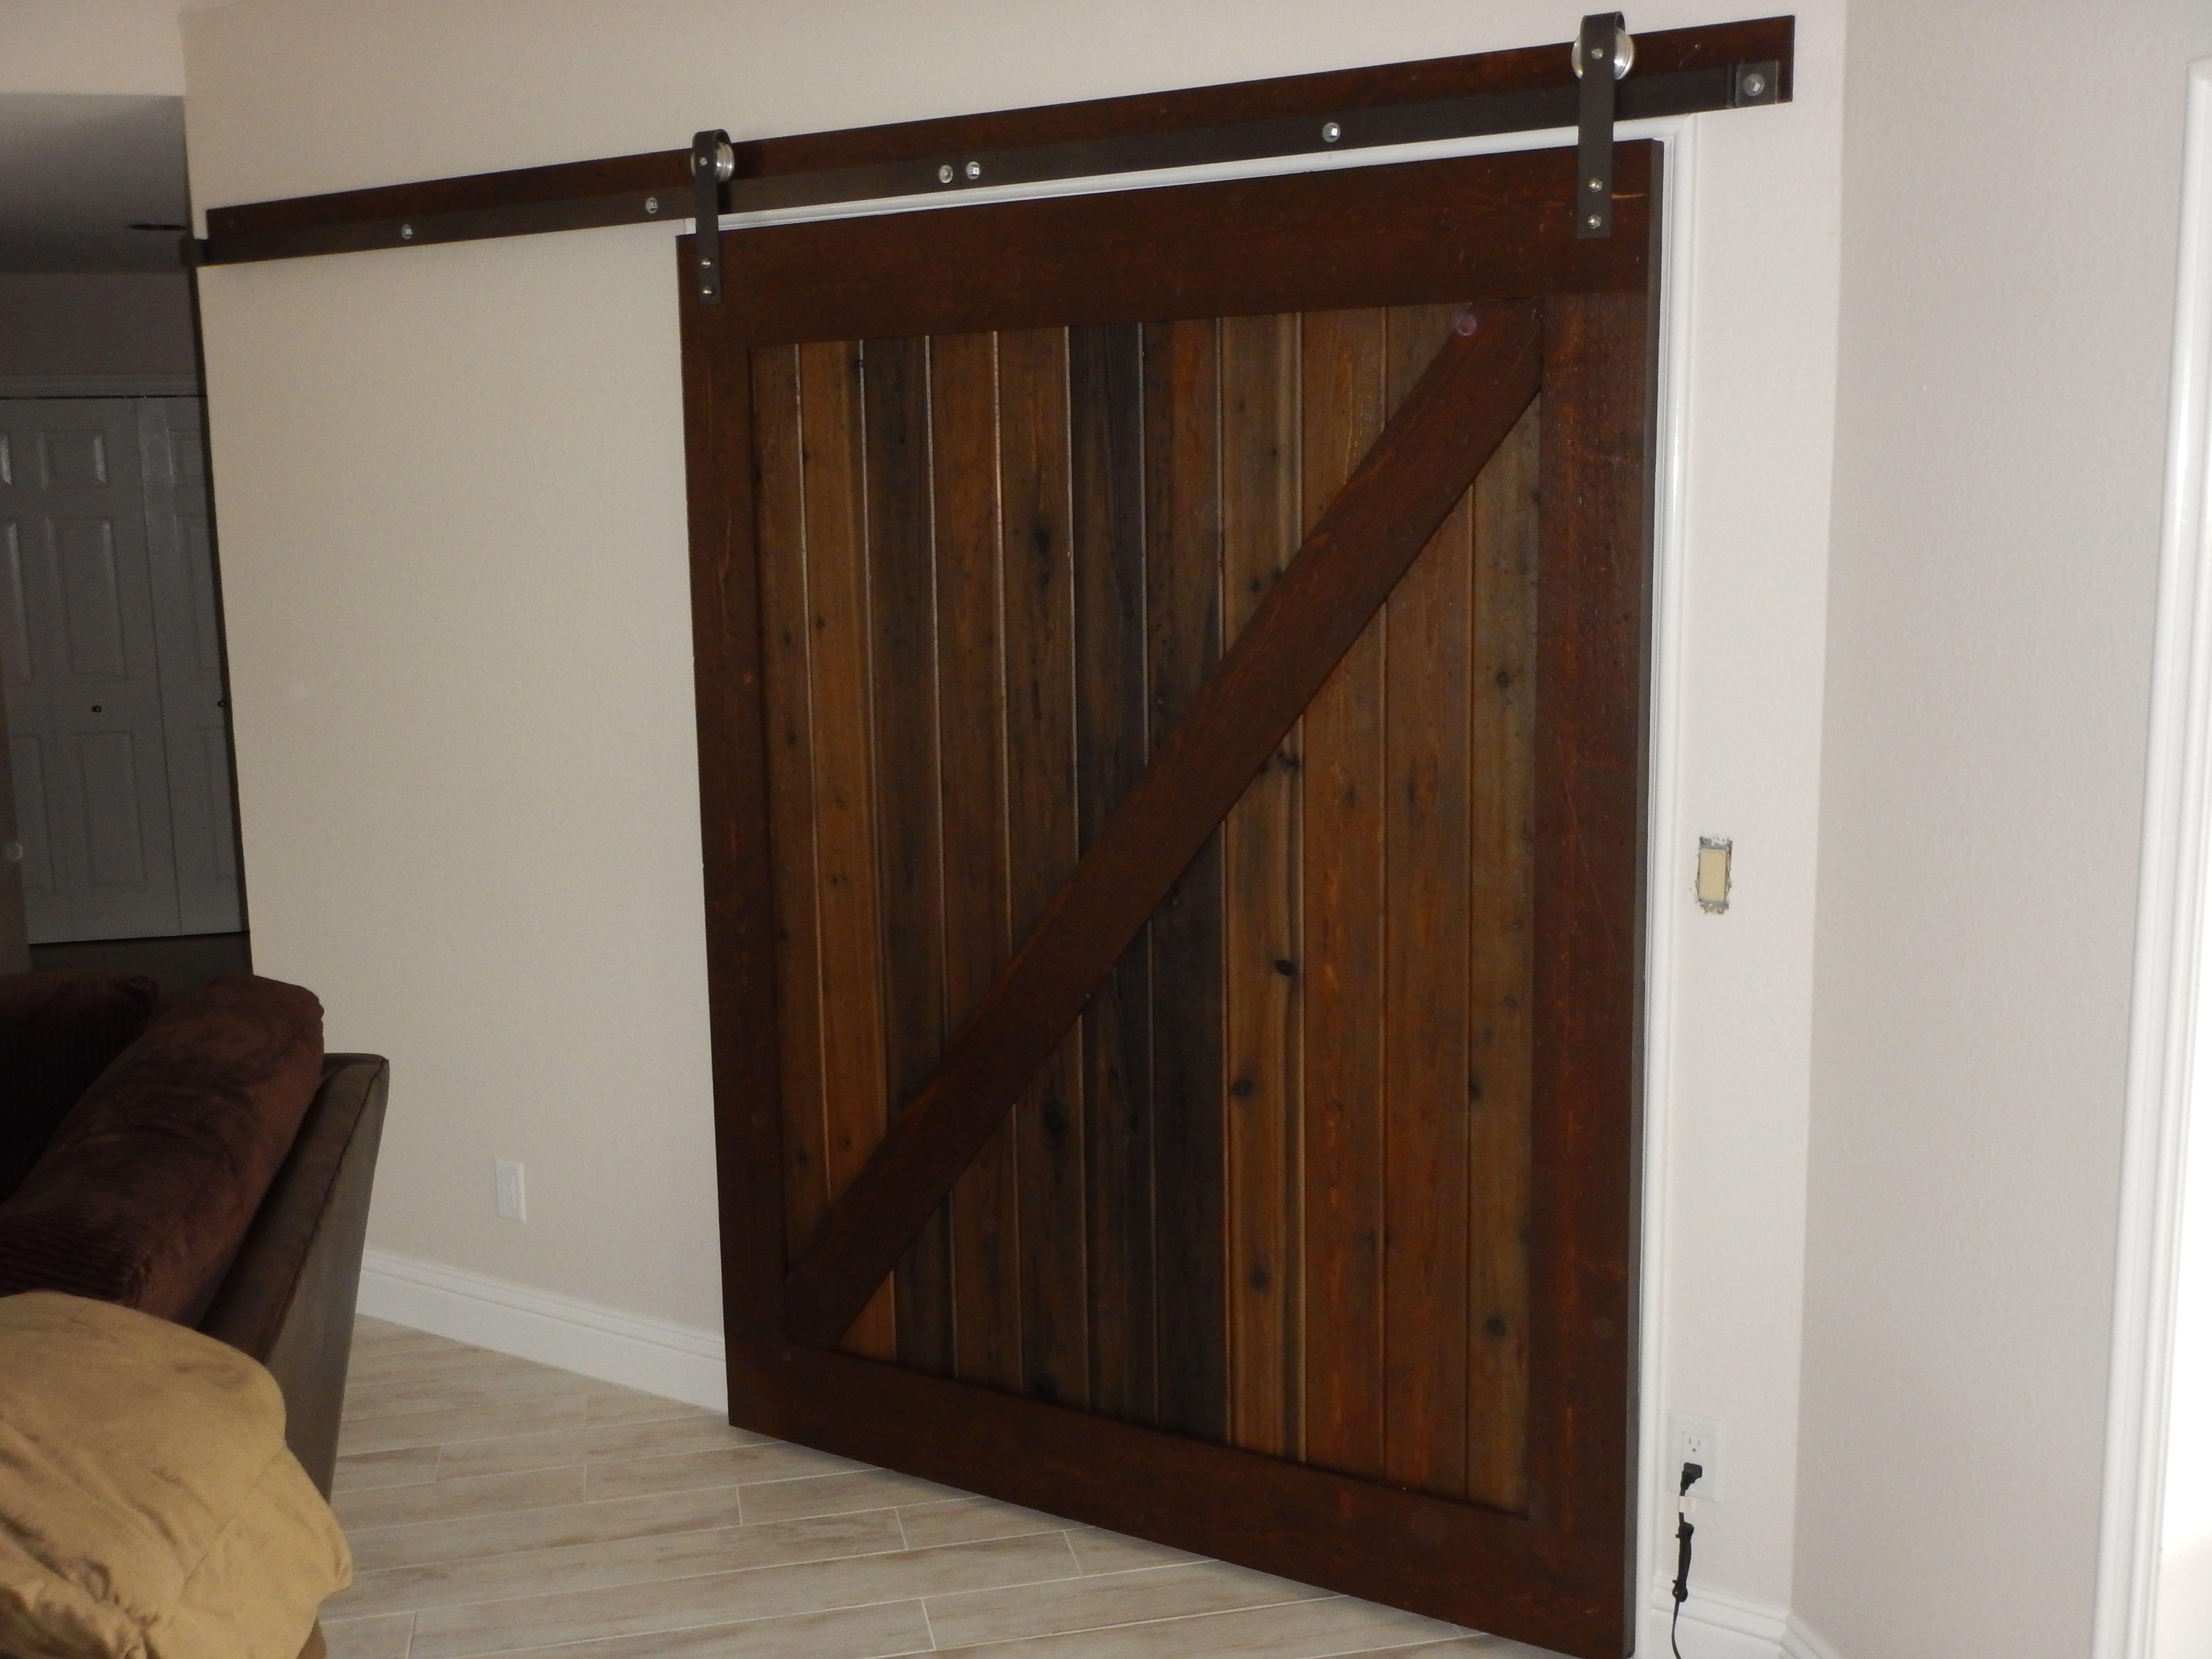 Custom Made Stressed Wood Rustic Barn Door By Naples